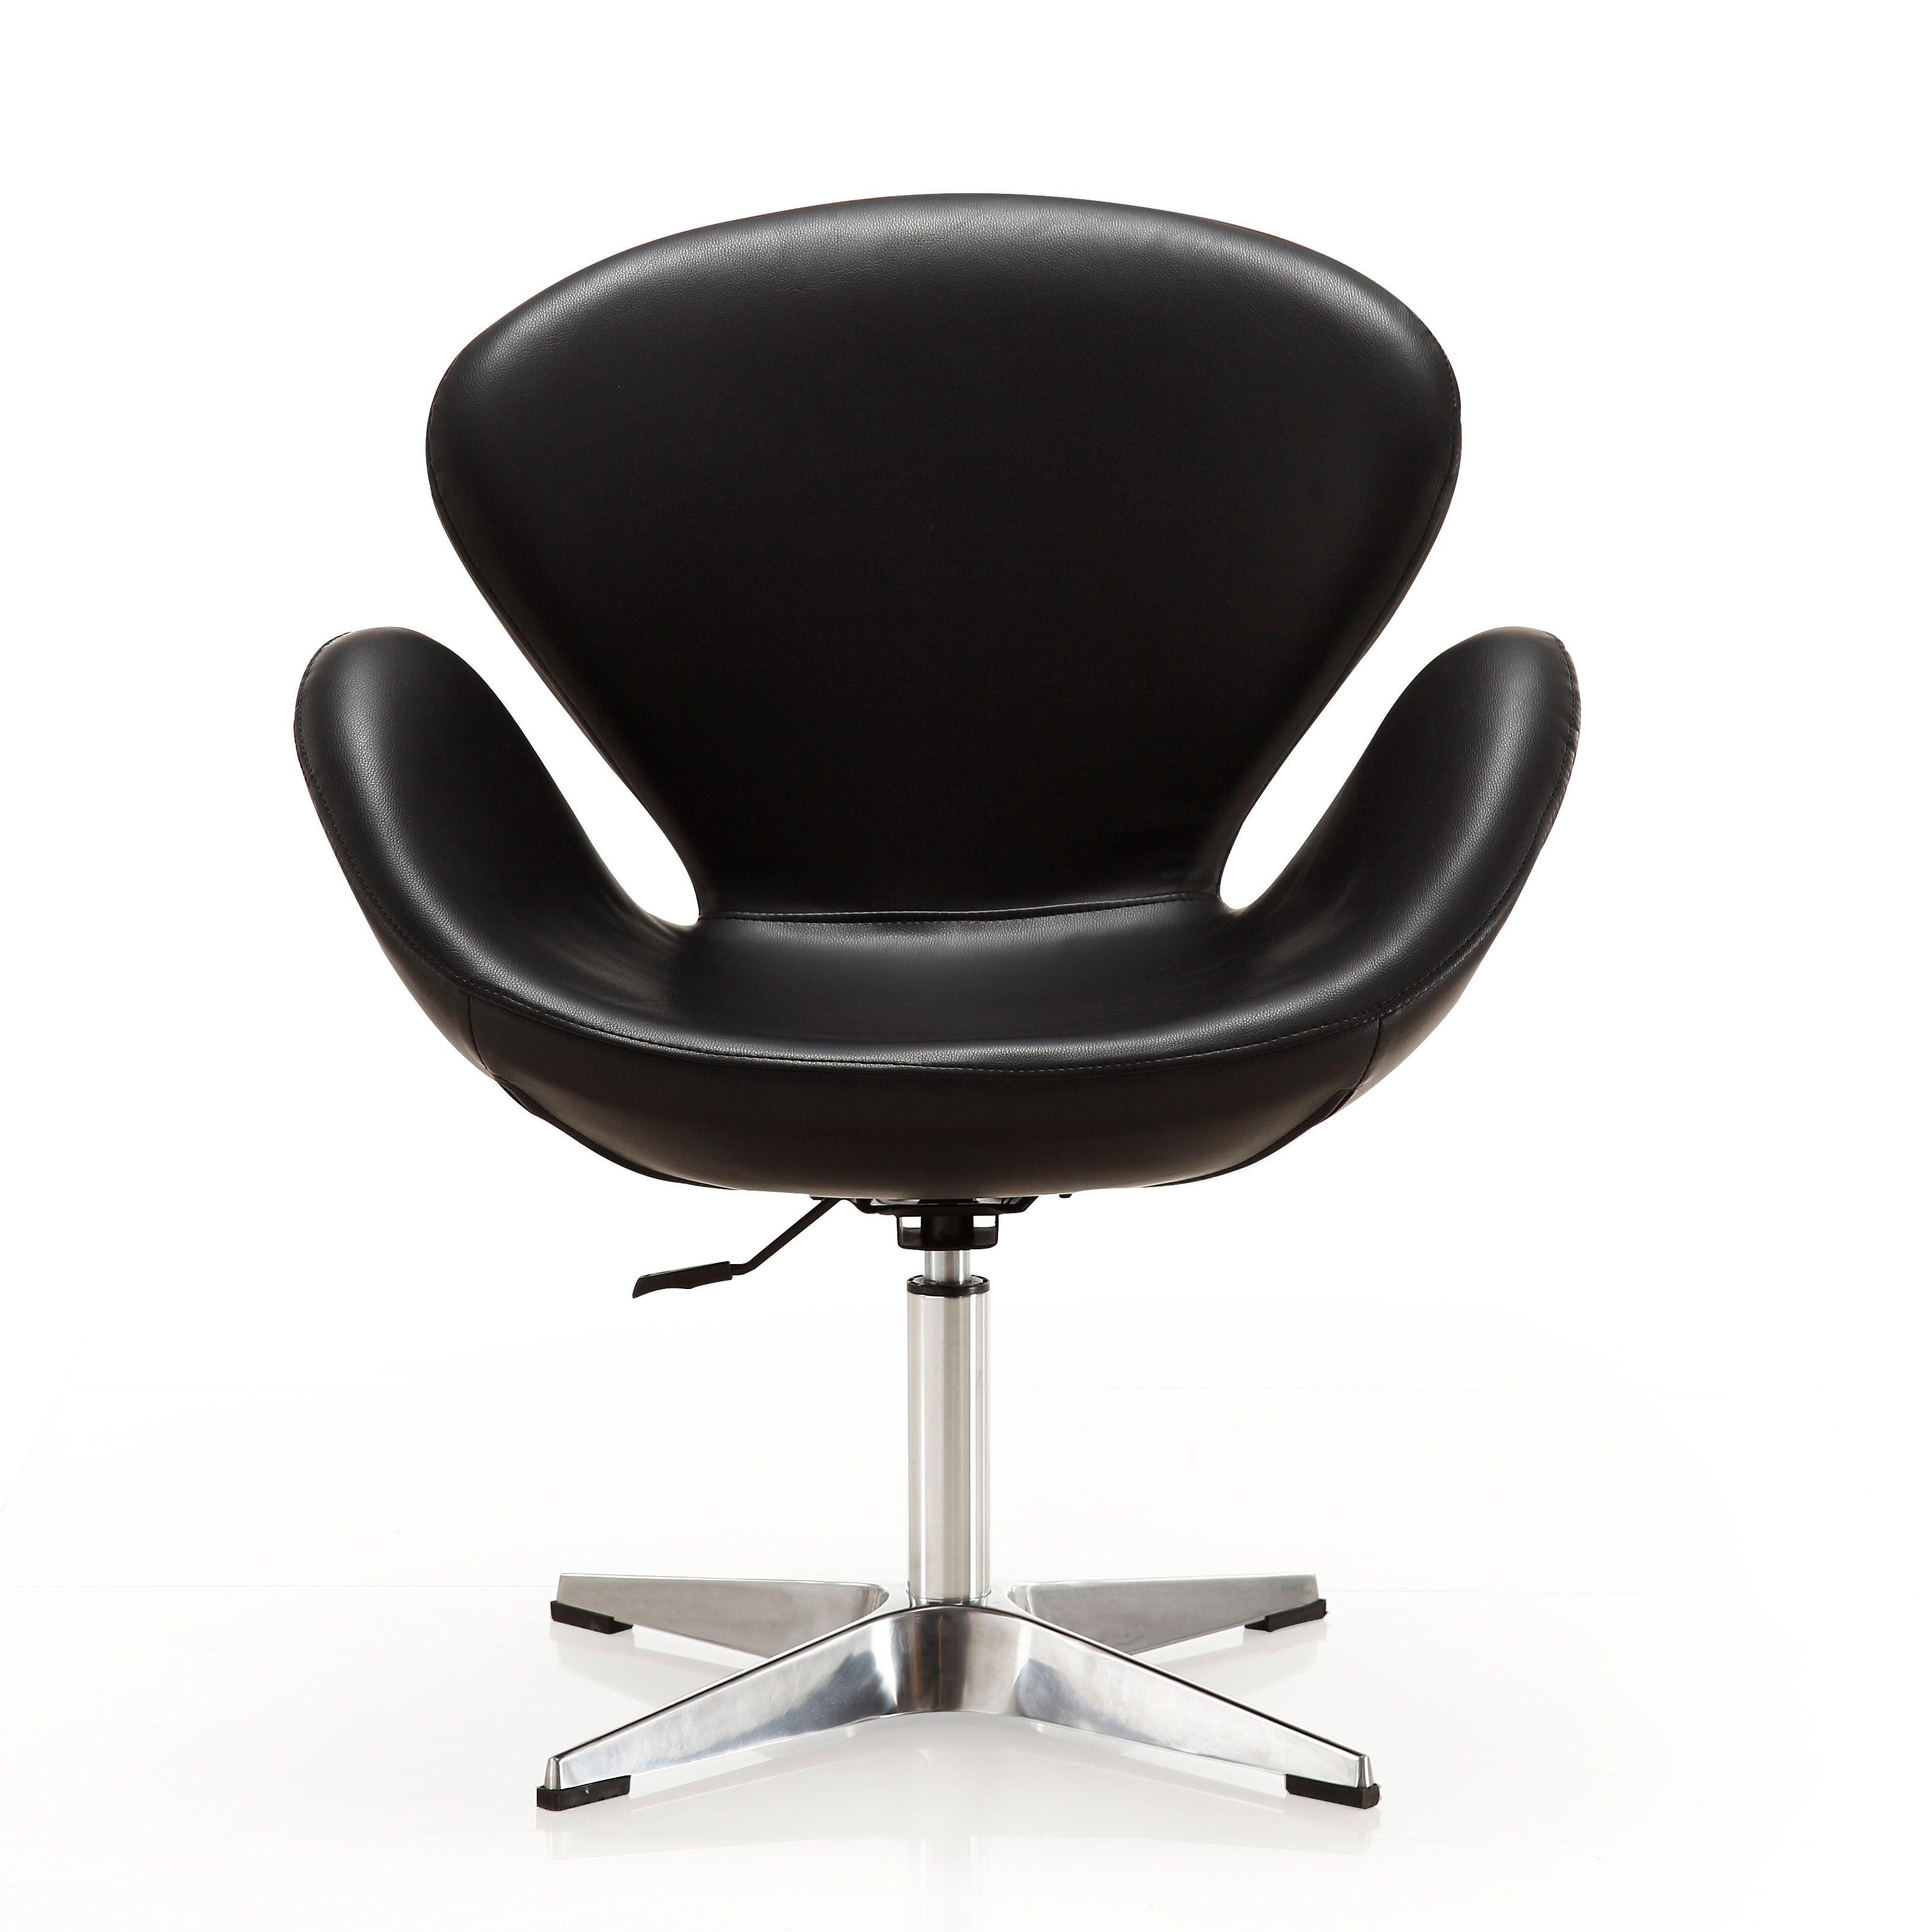 Fine Raspberry Leatherette Adjustable Swivel Accent Chair Cjindustries Chair Design For Home Cjindustriesco